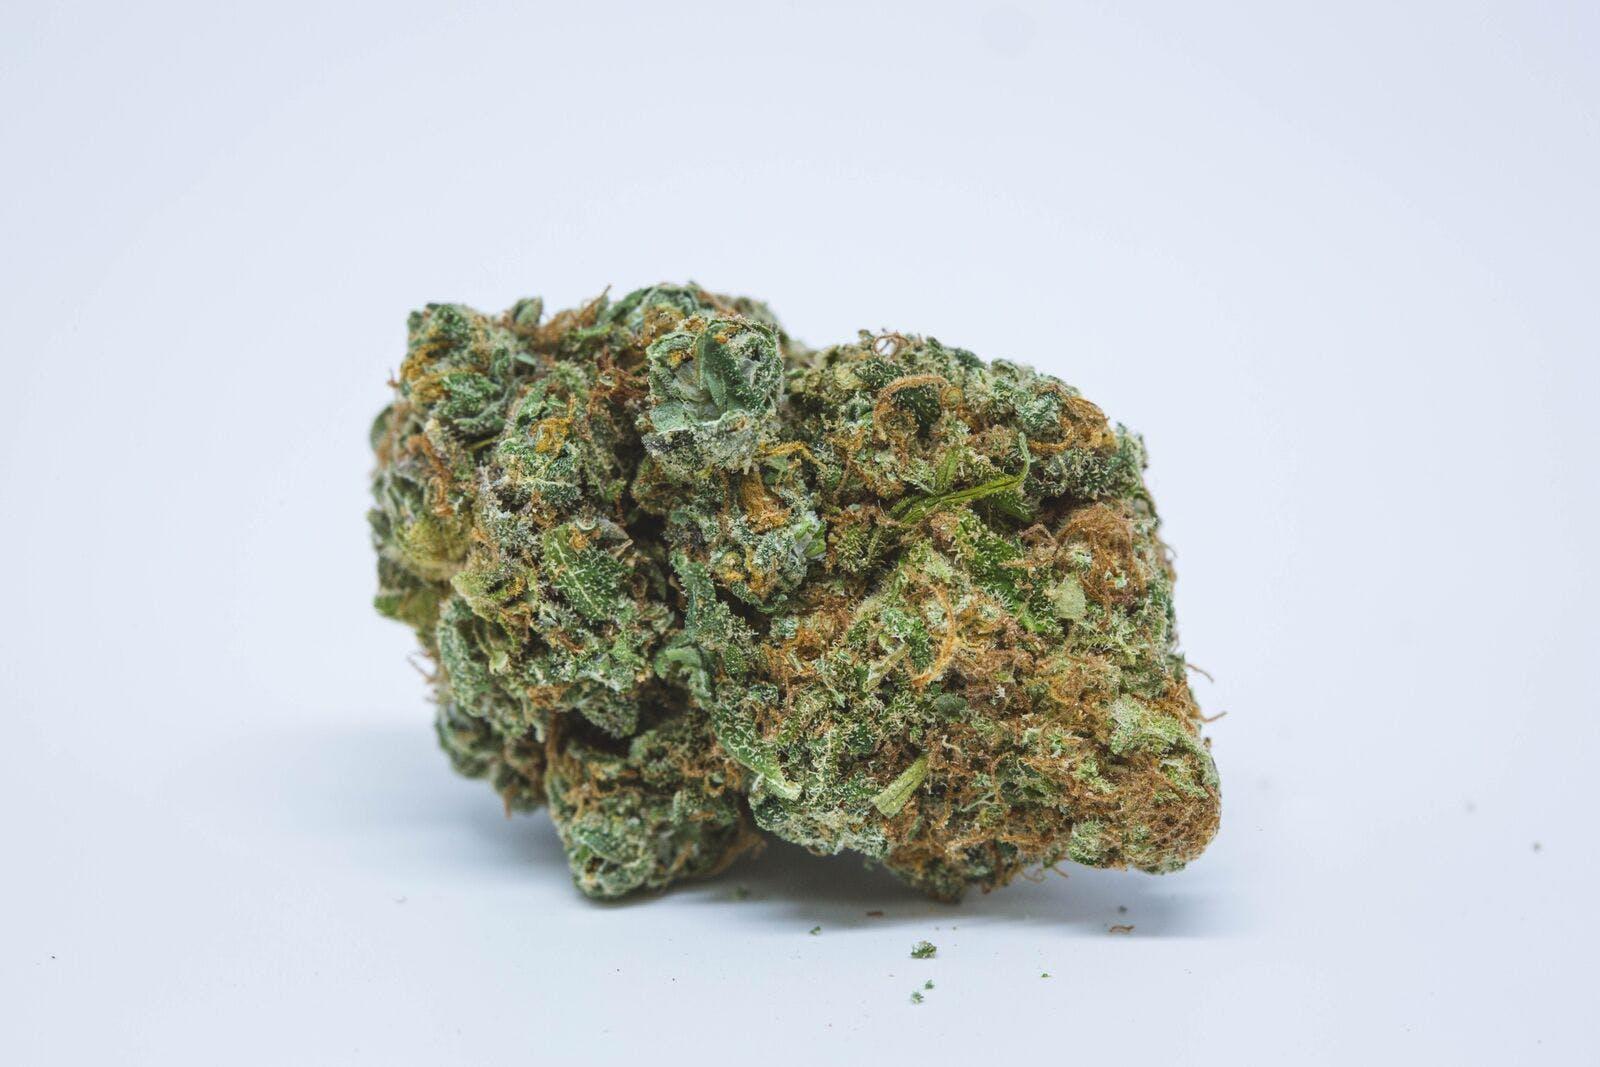 Electric Lemon G Weed; Electric Lemon G Cannabis Strain; Electric Lemon G Sativa Marijuana Strain